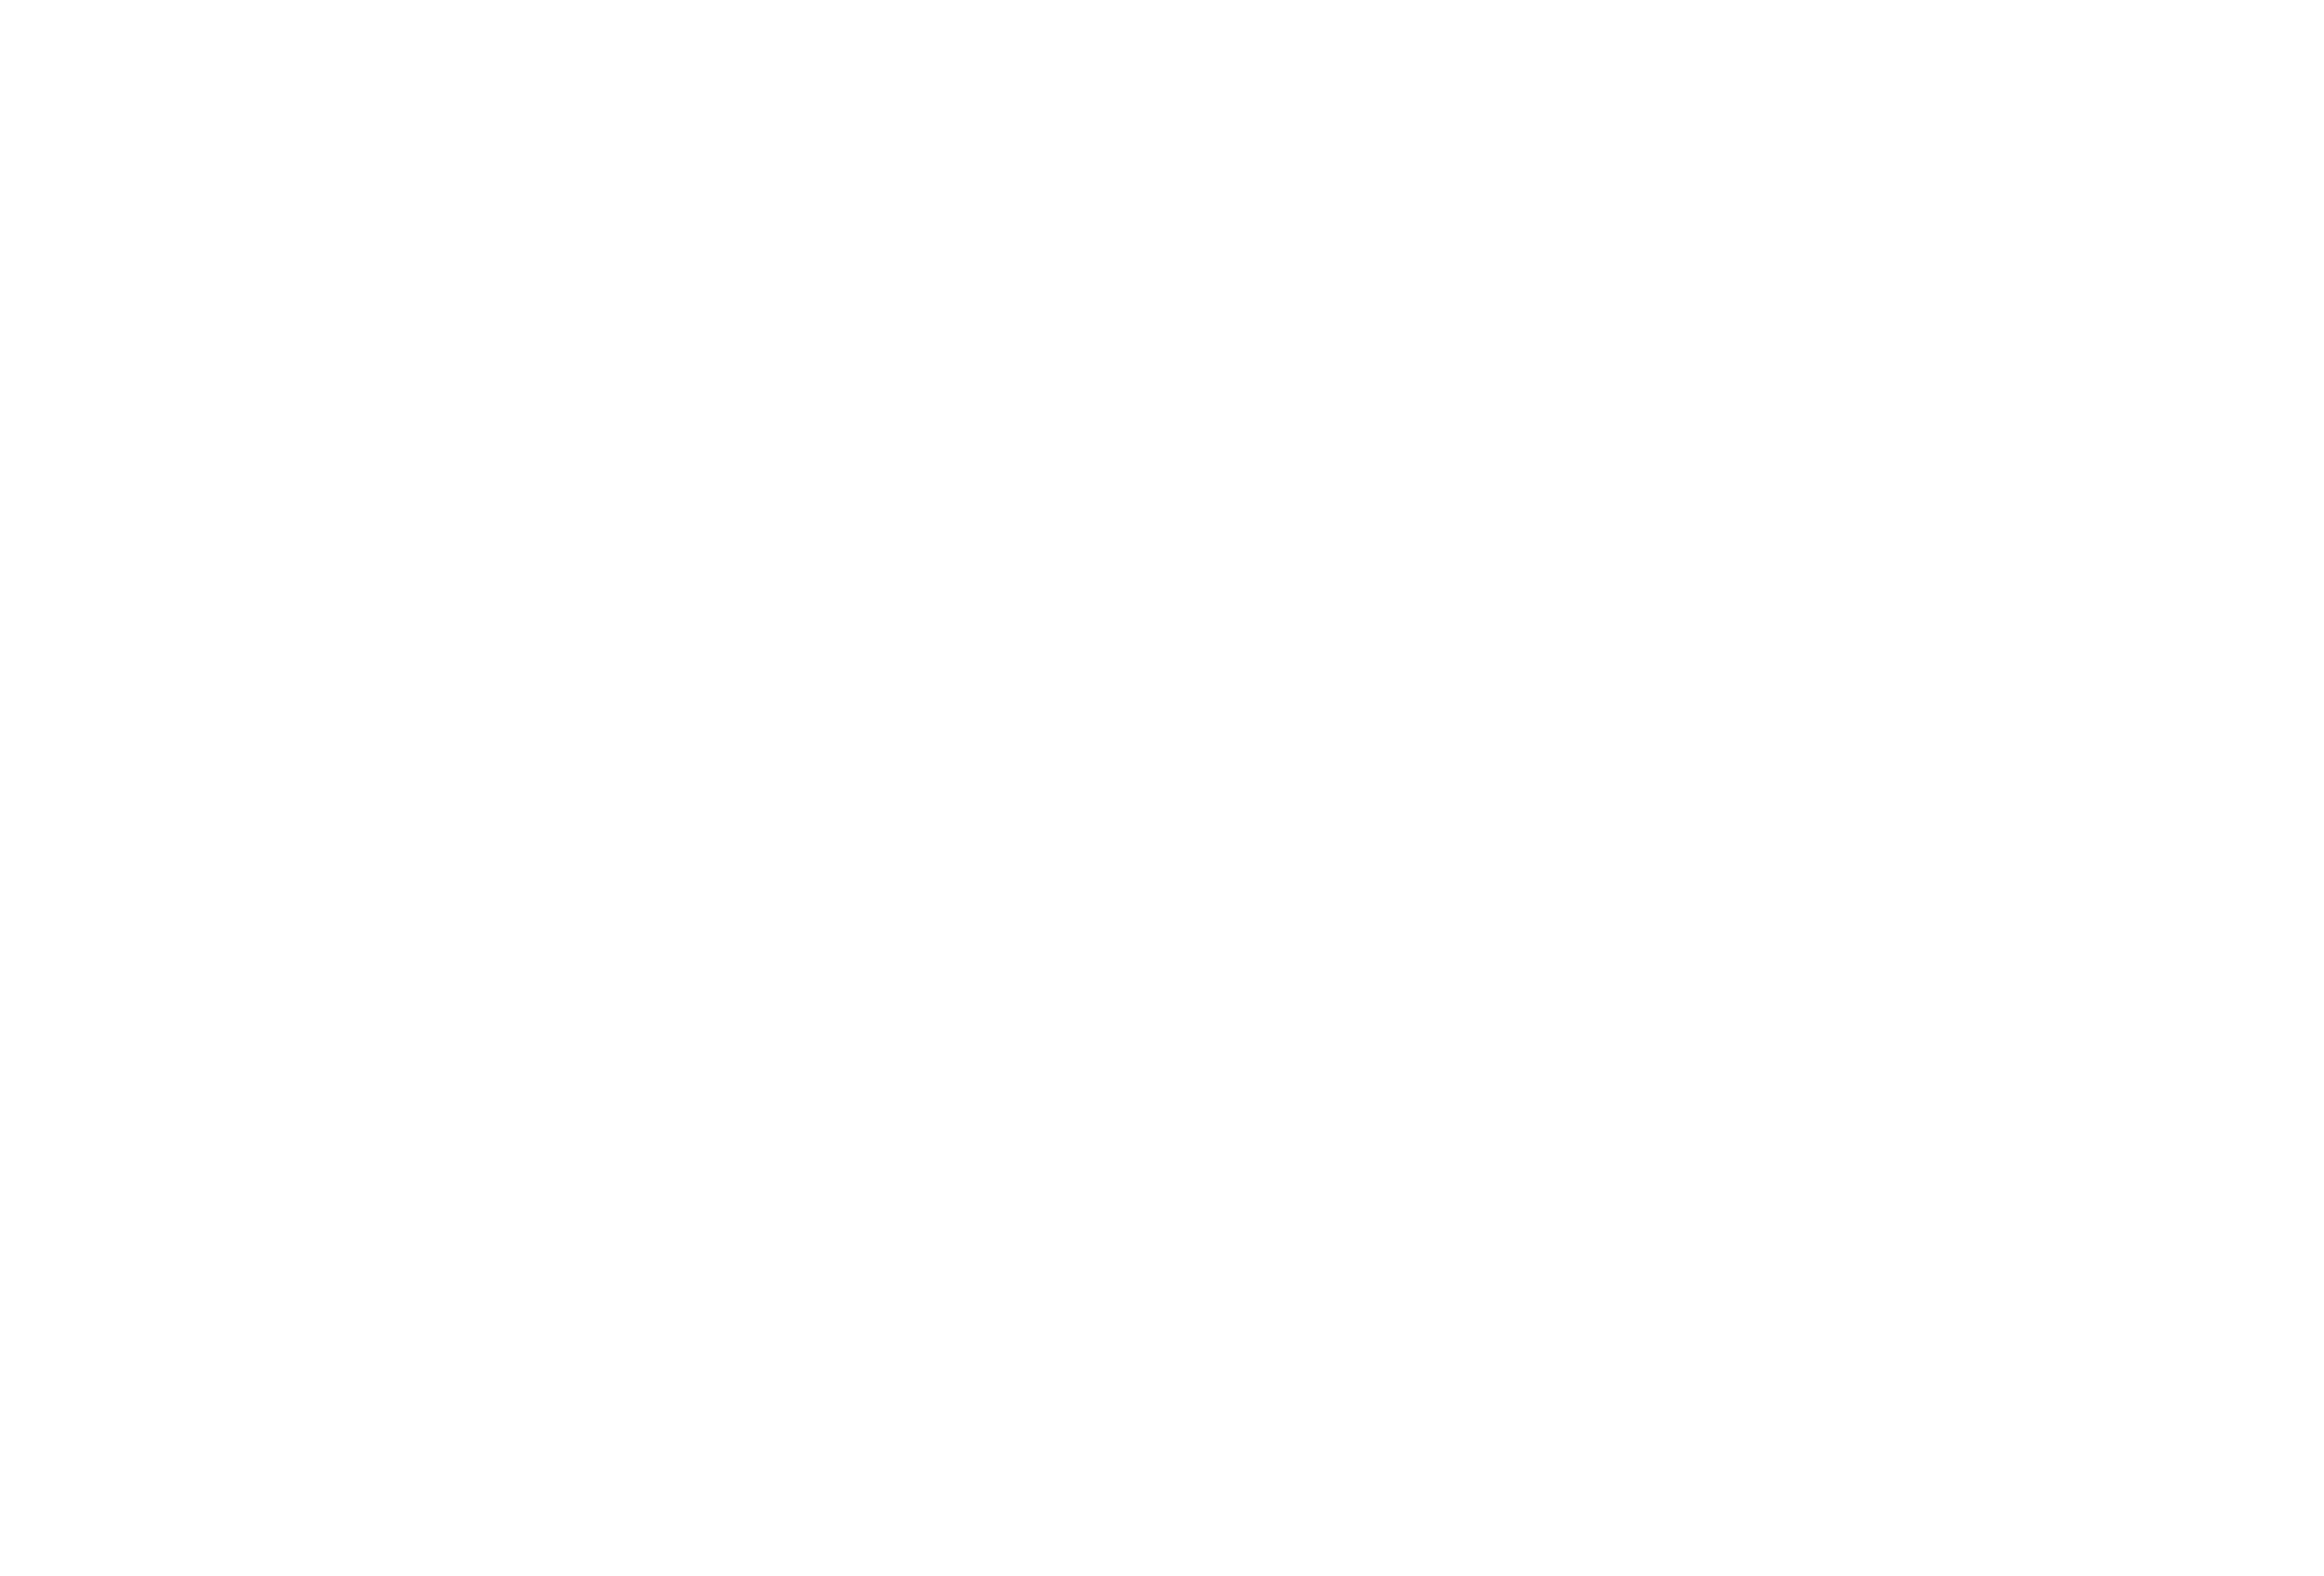 IDE Editora